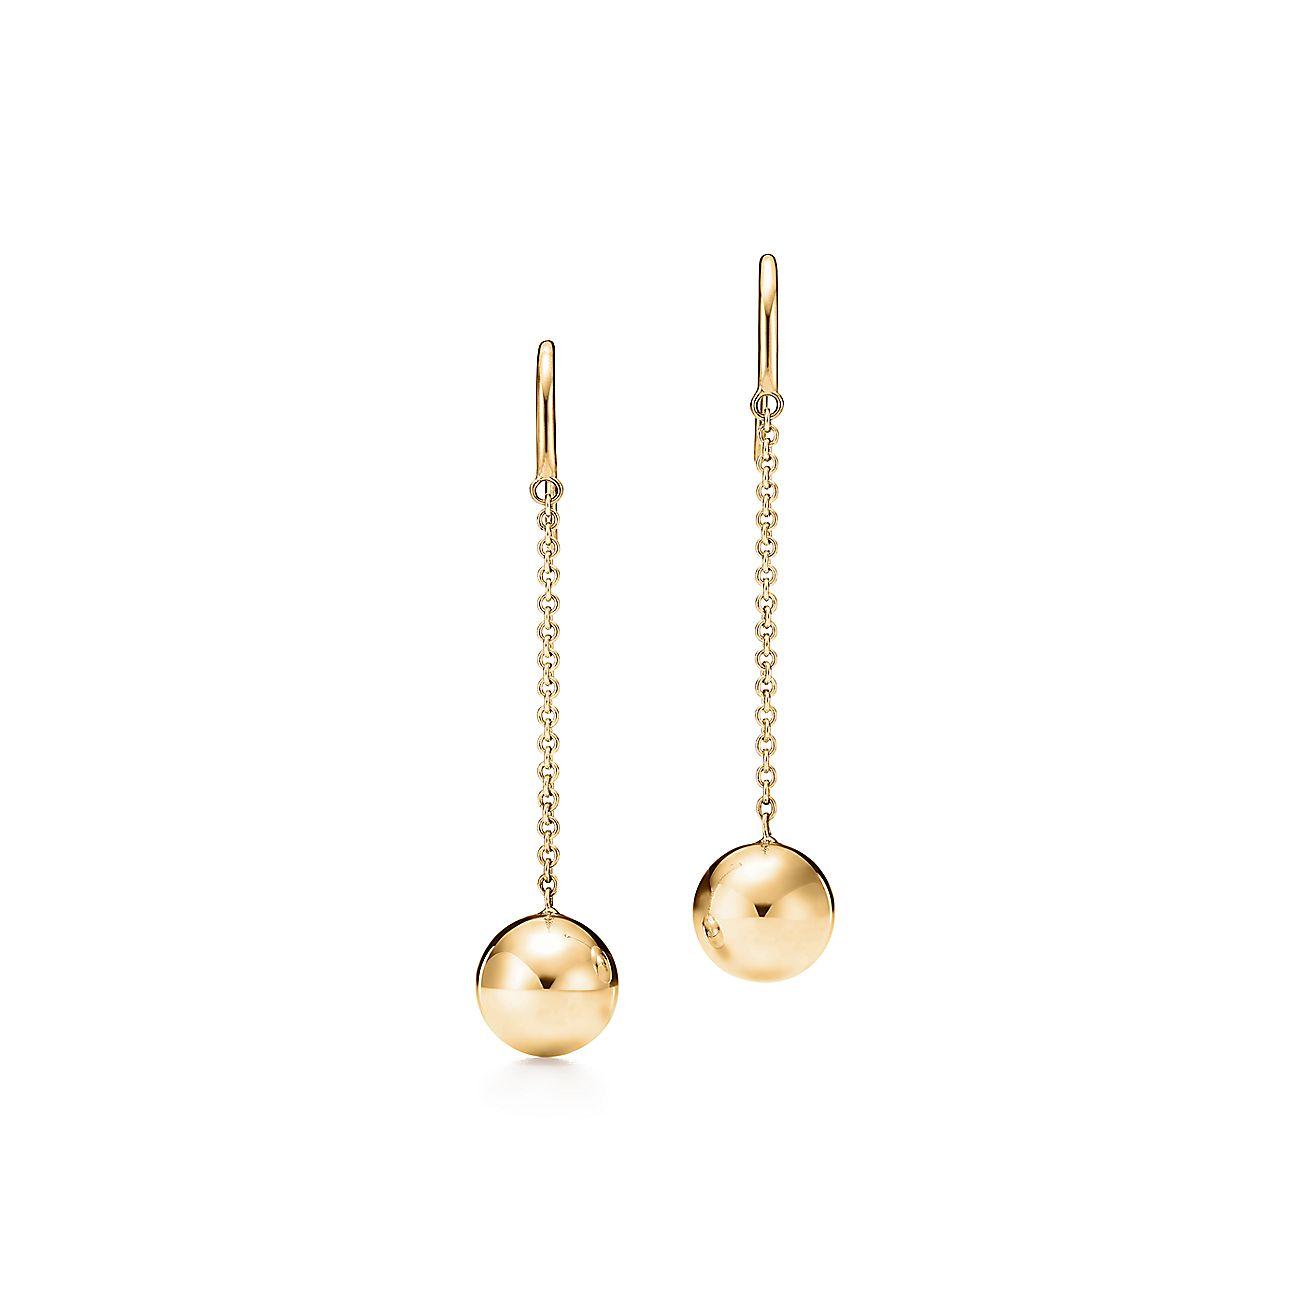 18k Gold Ball Hook Earrings